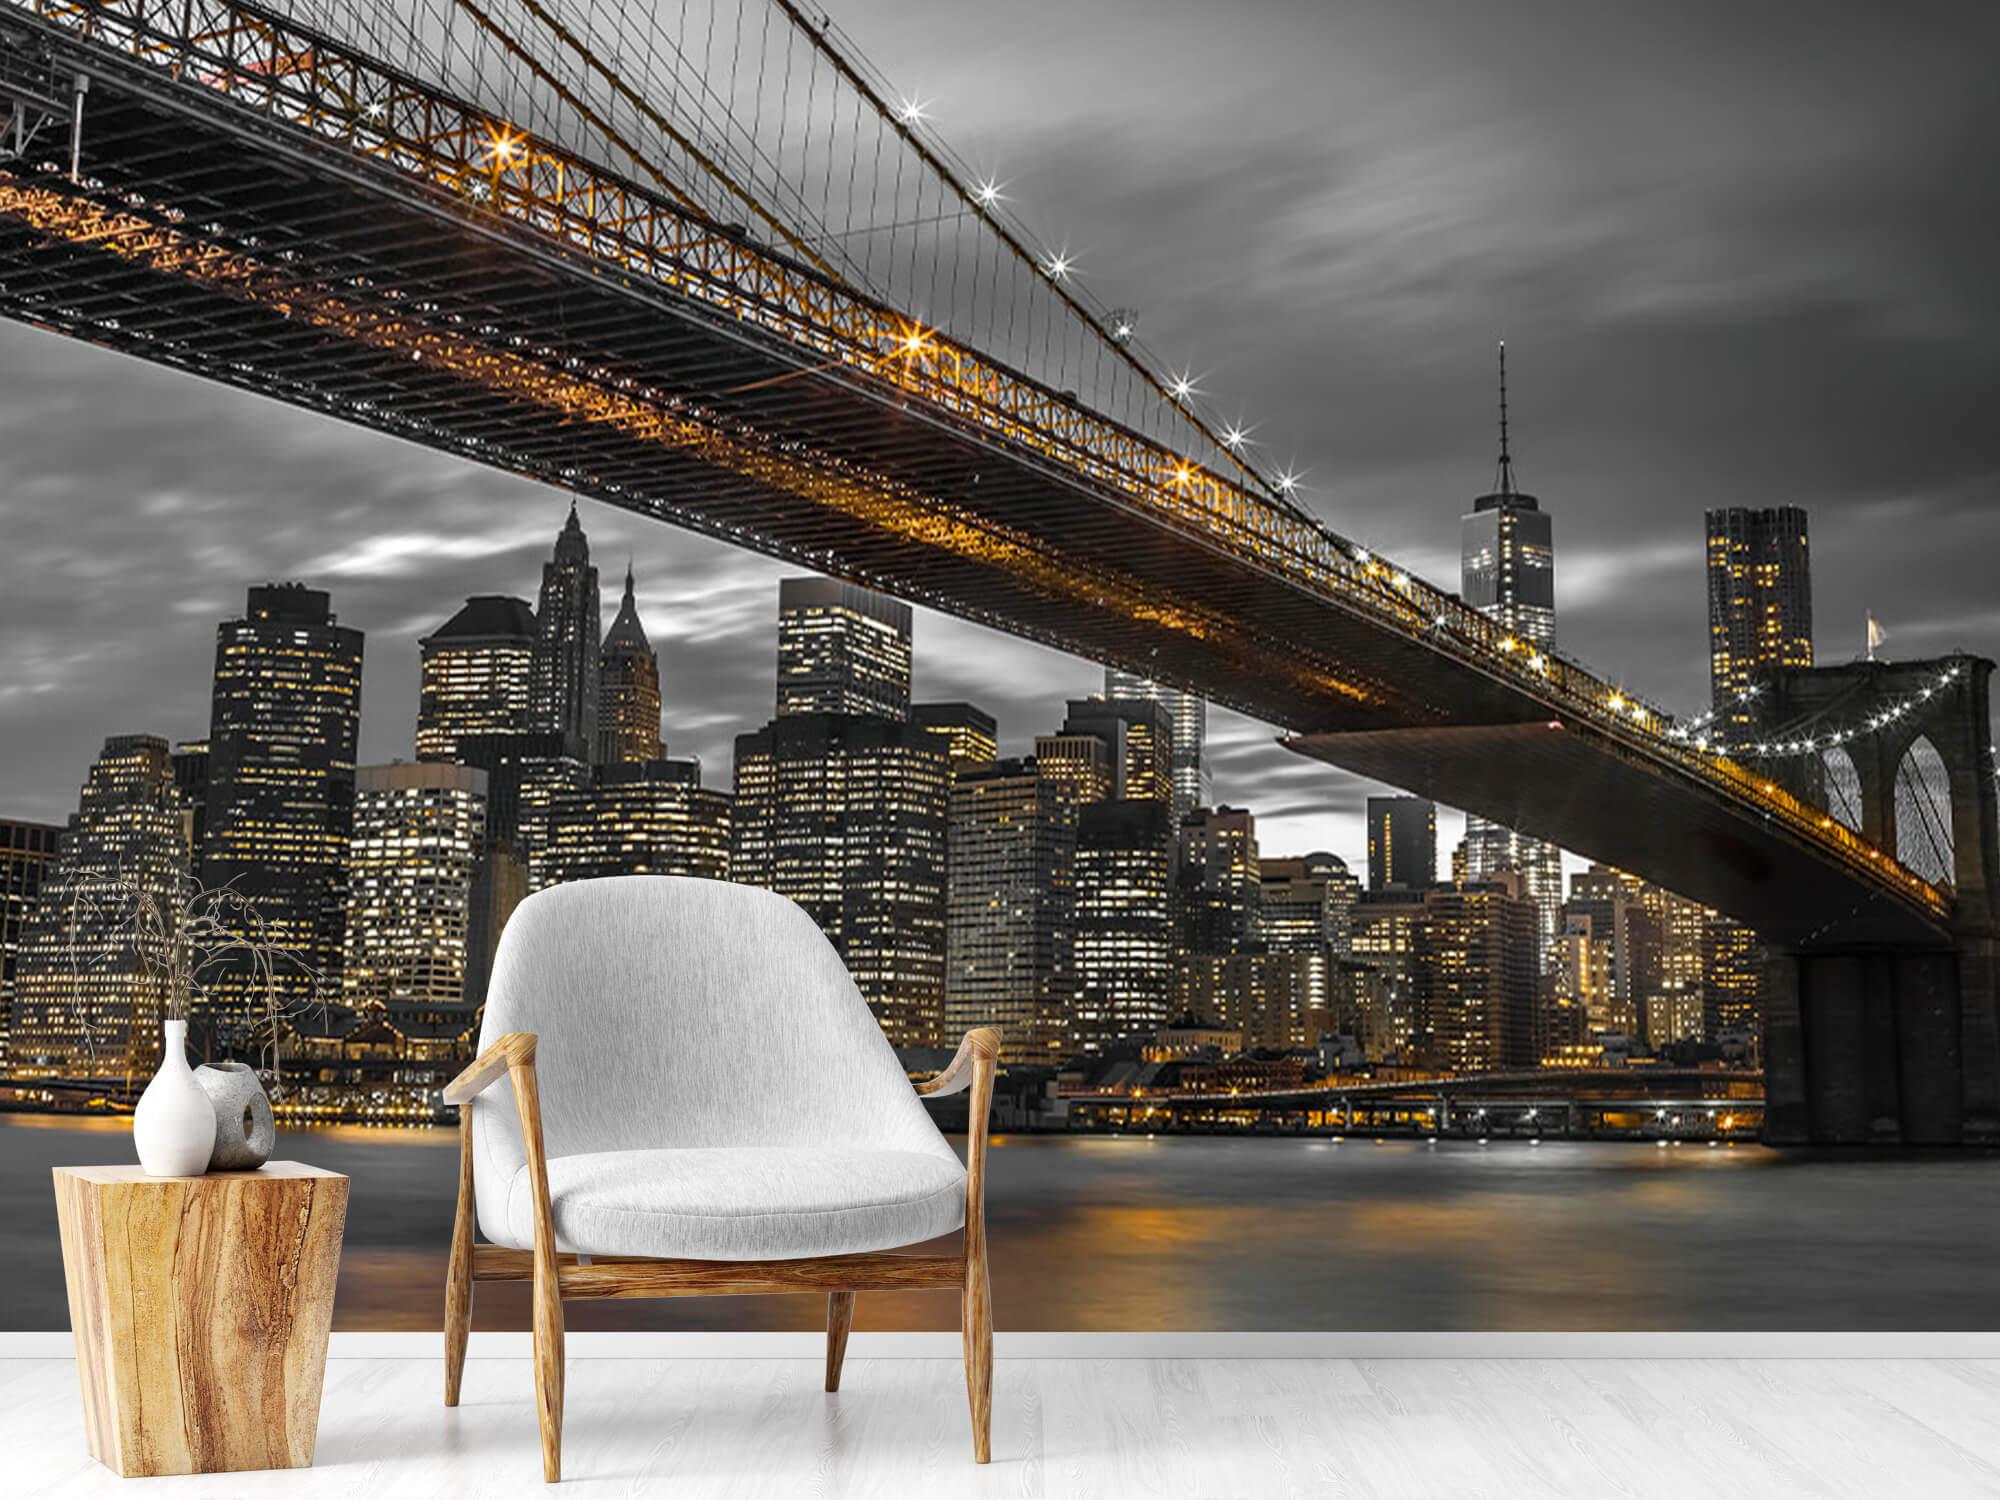 Brooklyn Bridge, New York 17